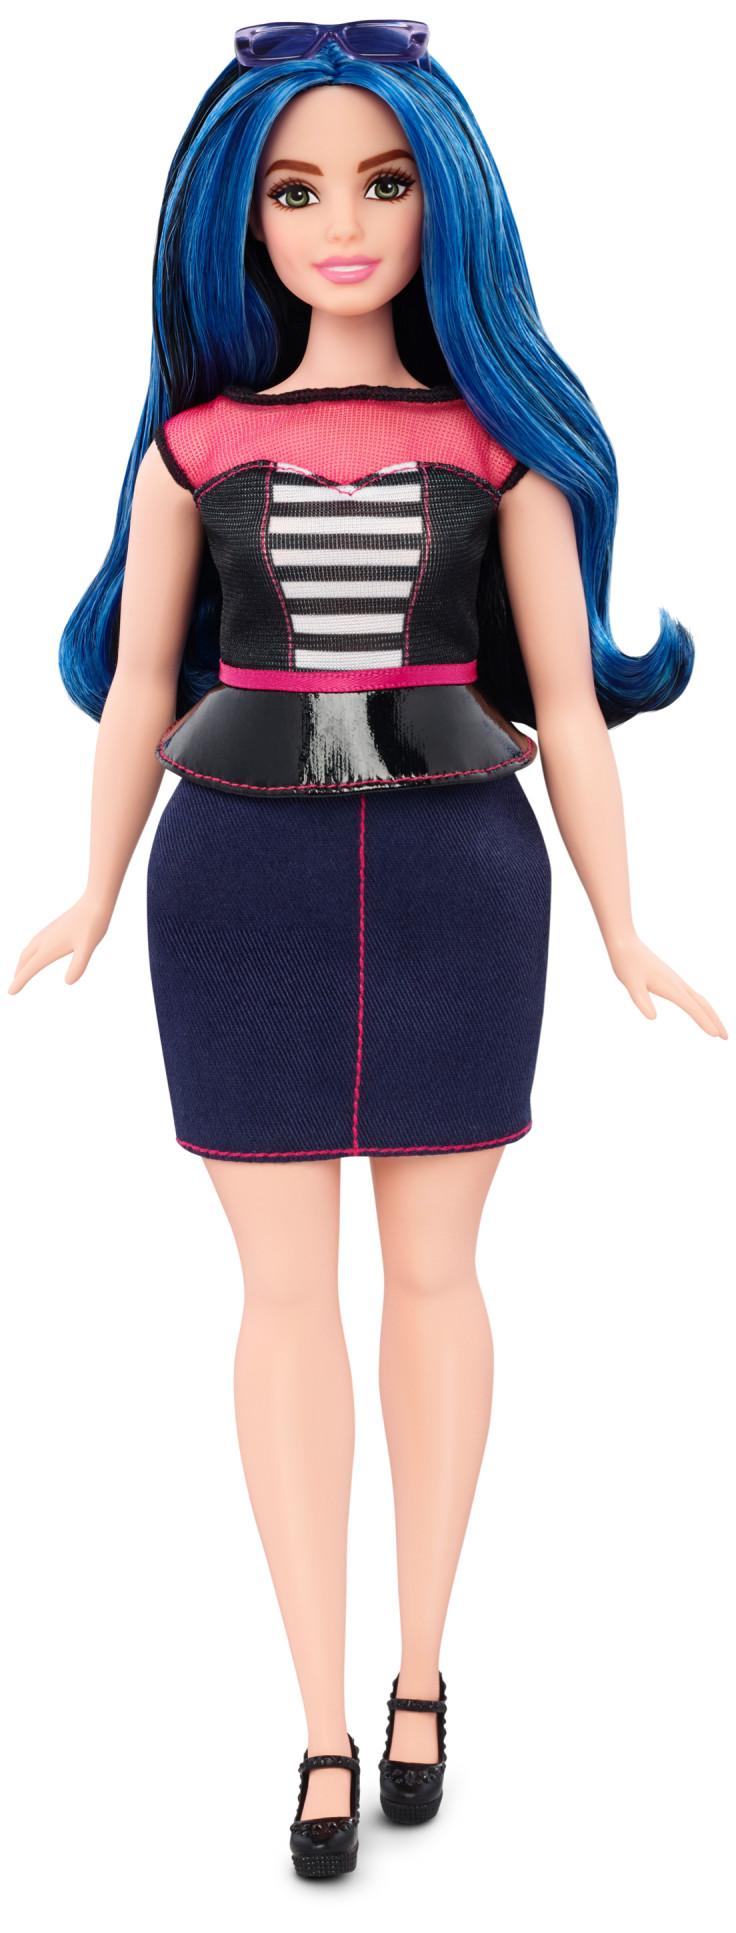 The curvy Barbie